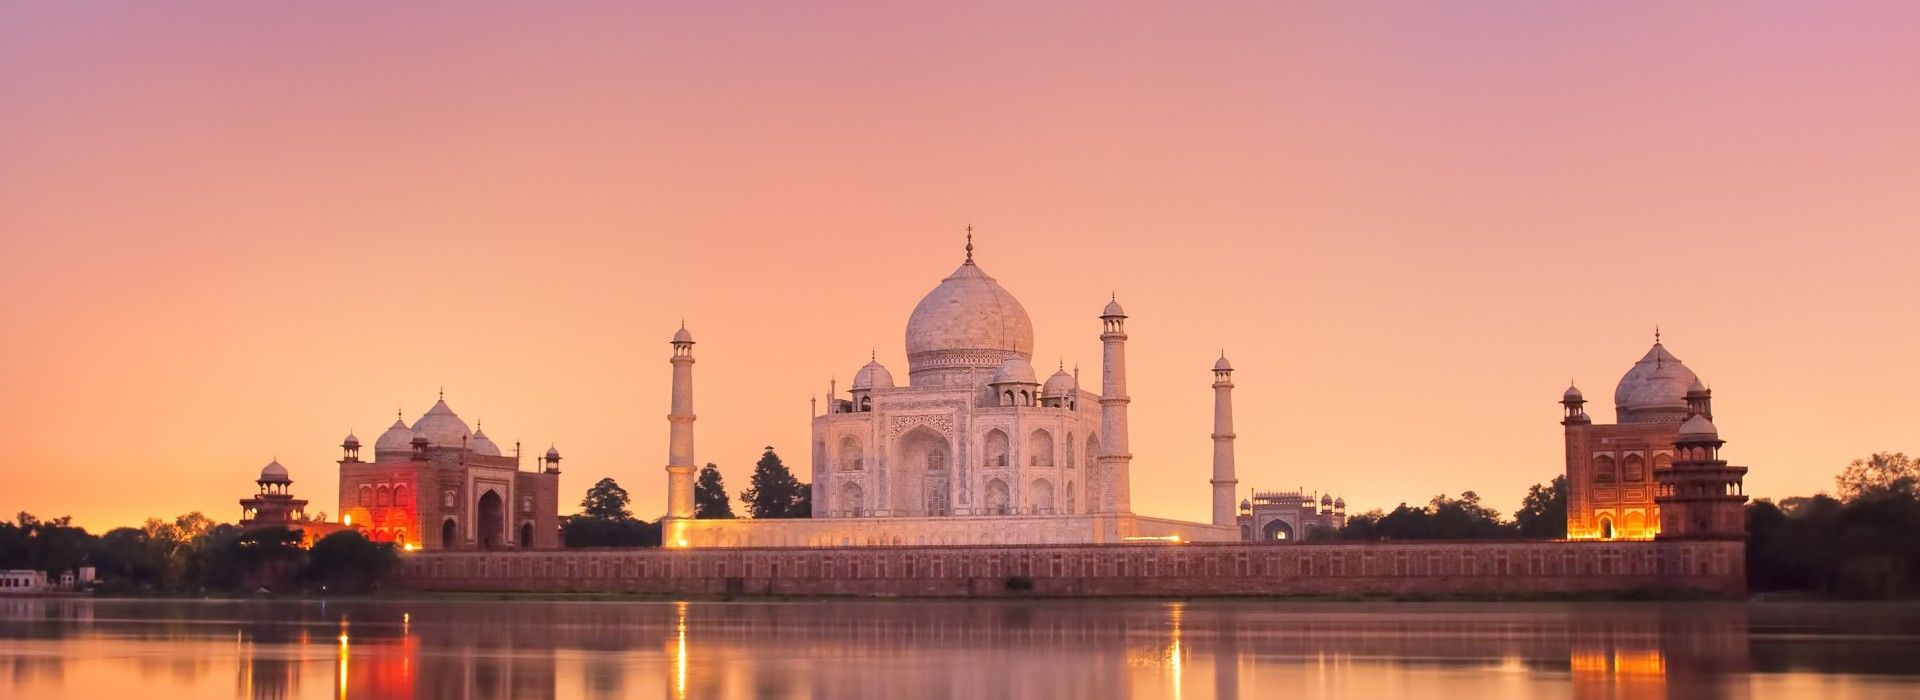 Adventure and sport Tours in Delhi & Golden Triangle